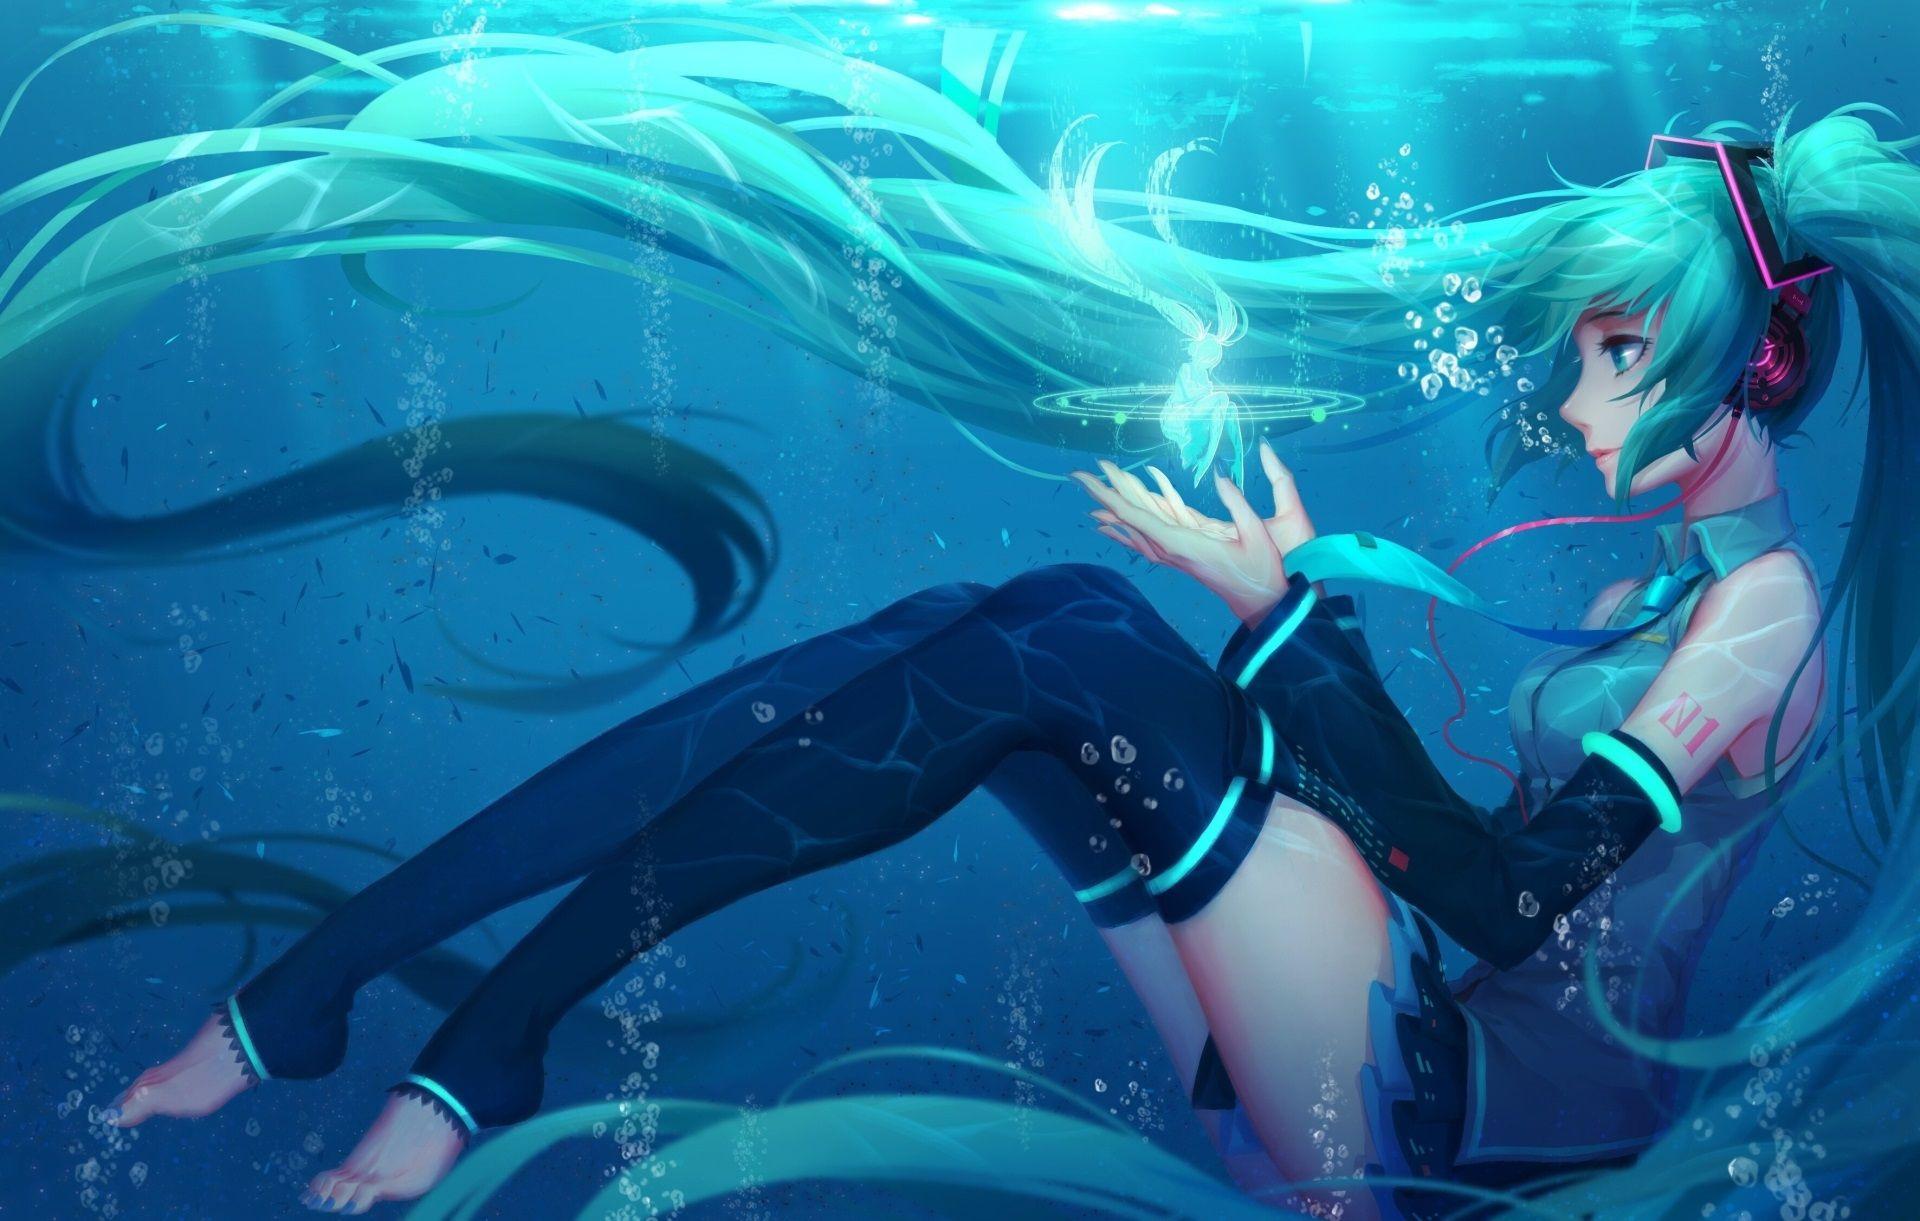 1920x1221 Anime Desktop Wallpaper High Resolution Free Download Hatsune Miku Miku Miku Hatsune Vocaloid